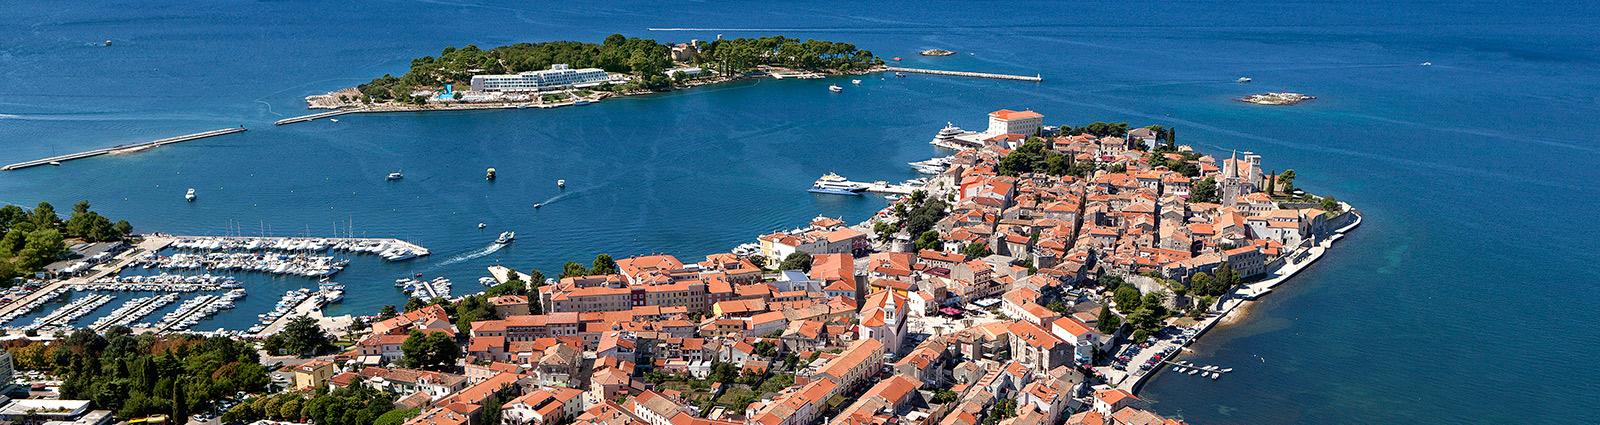 Poreč, Croatia | Valamar Hotels & Resorts